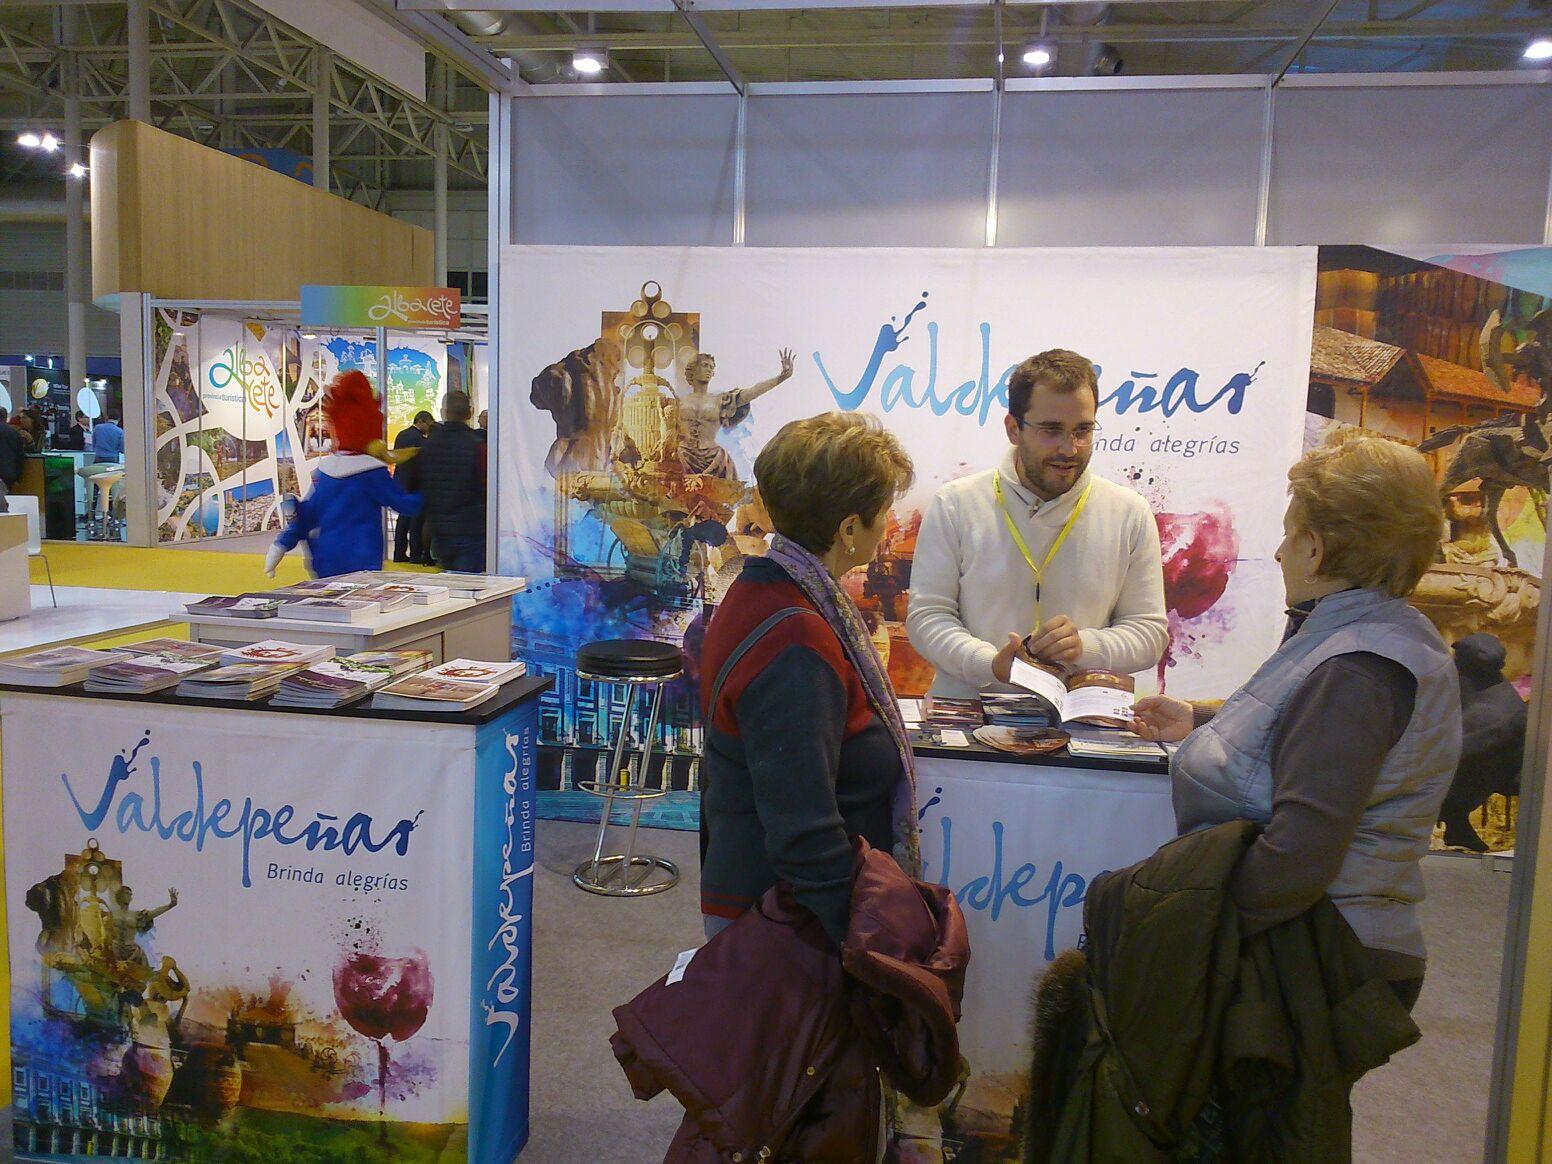 Valdepeñas se promocionó en la XX Feria Internacional de Turismo Interior (INTUR)